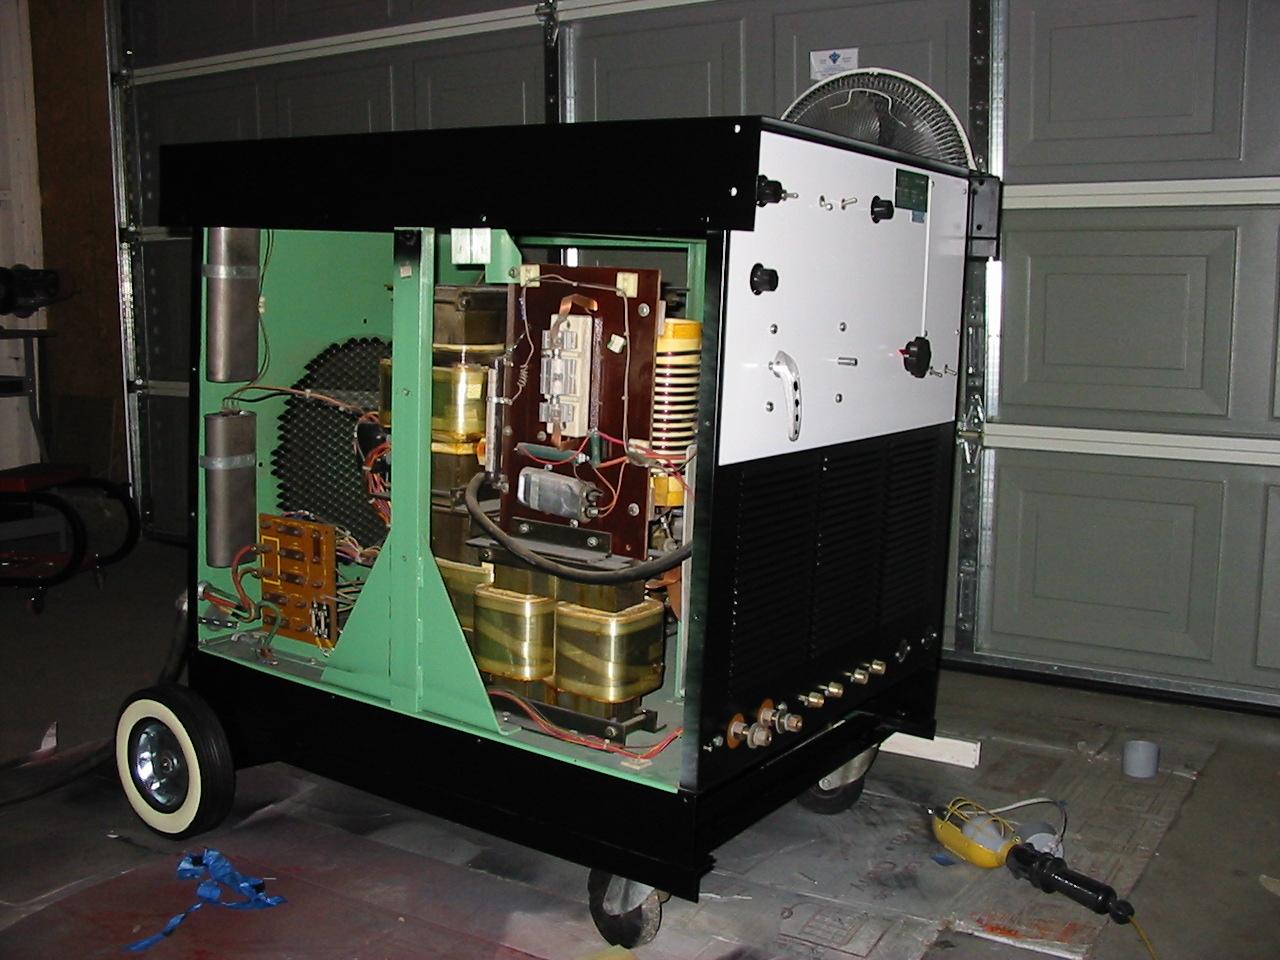 hot rod ucc 305 rh app aws org Linde Welding Machine Parts Linde UCC 305 TIG Welder